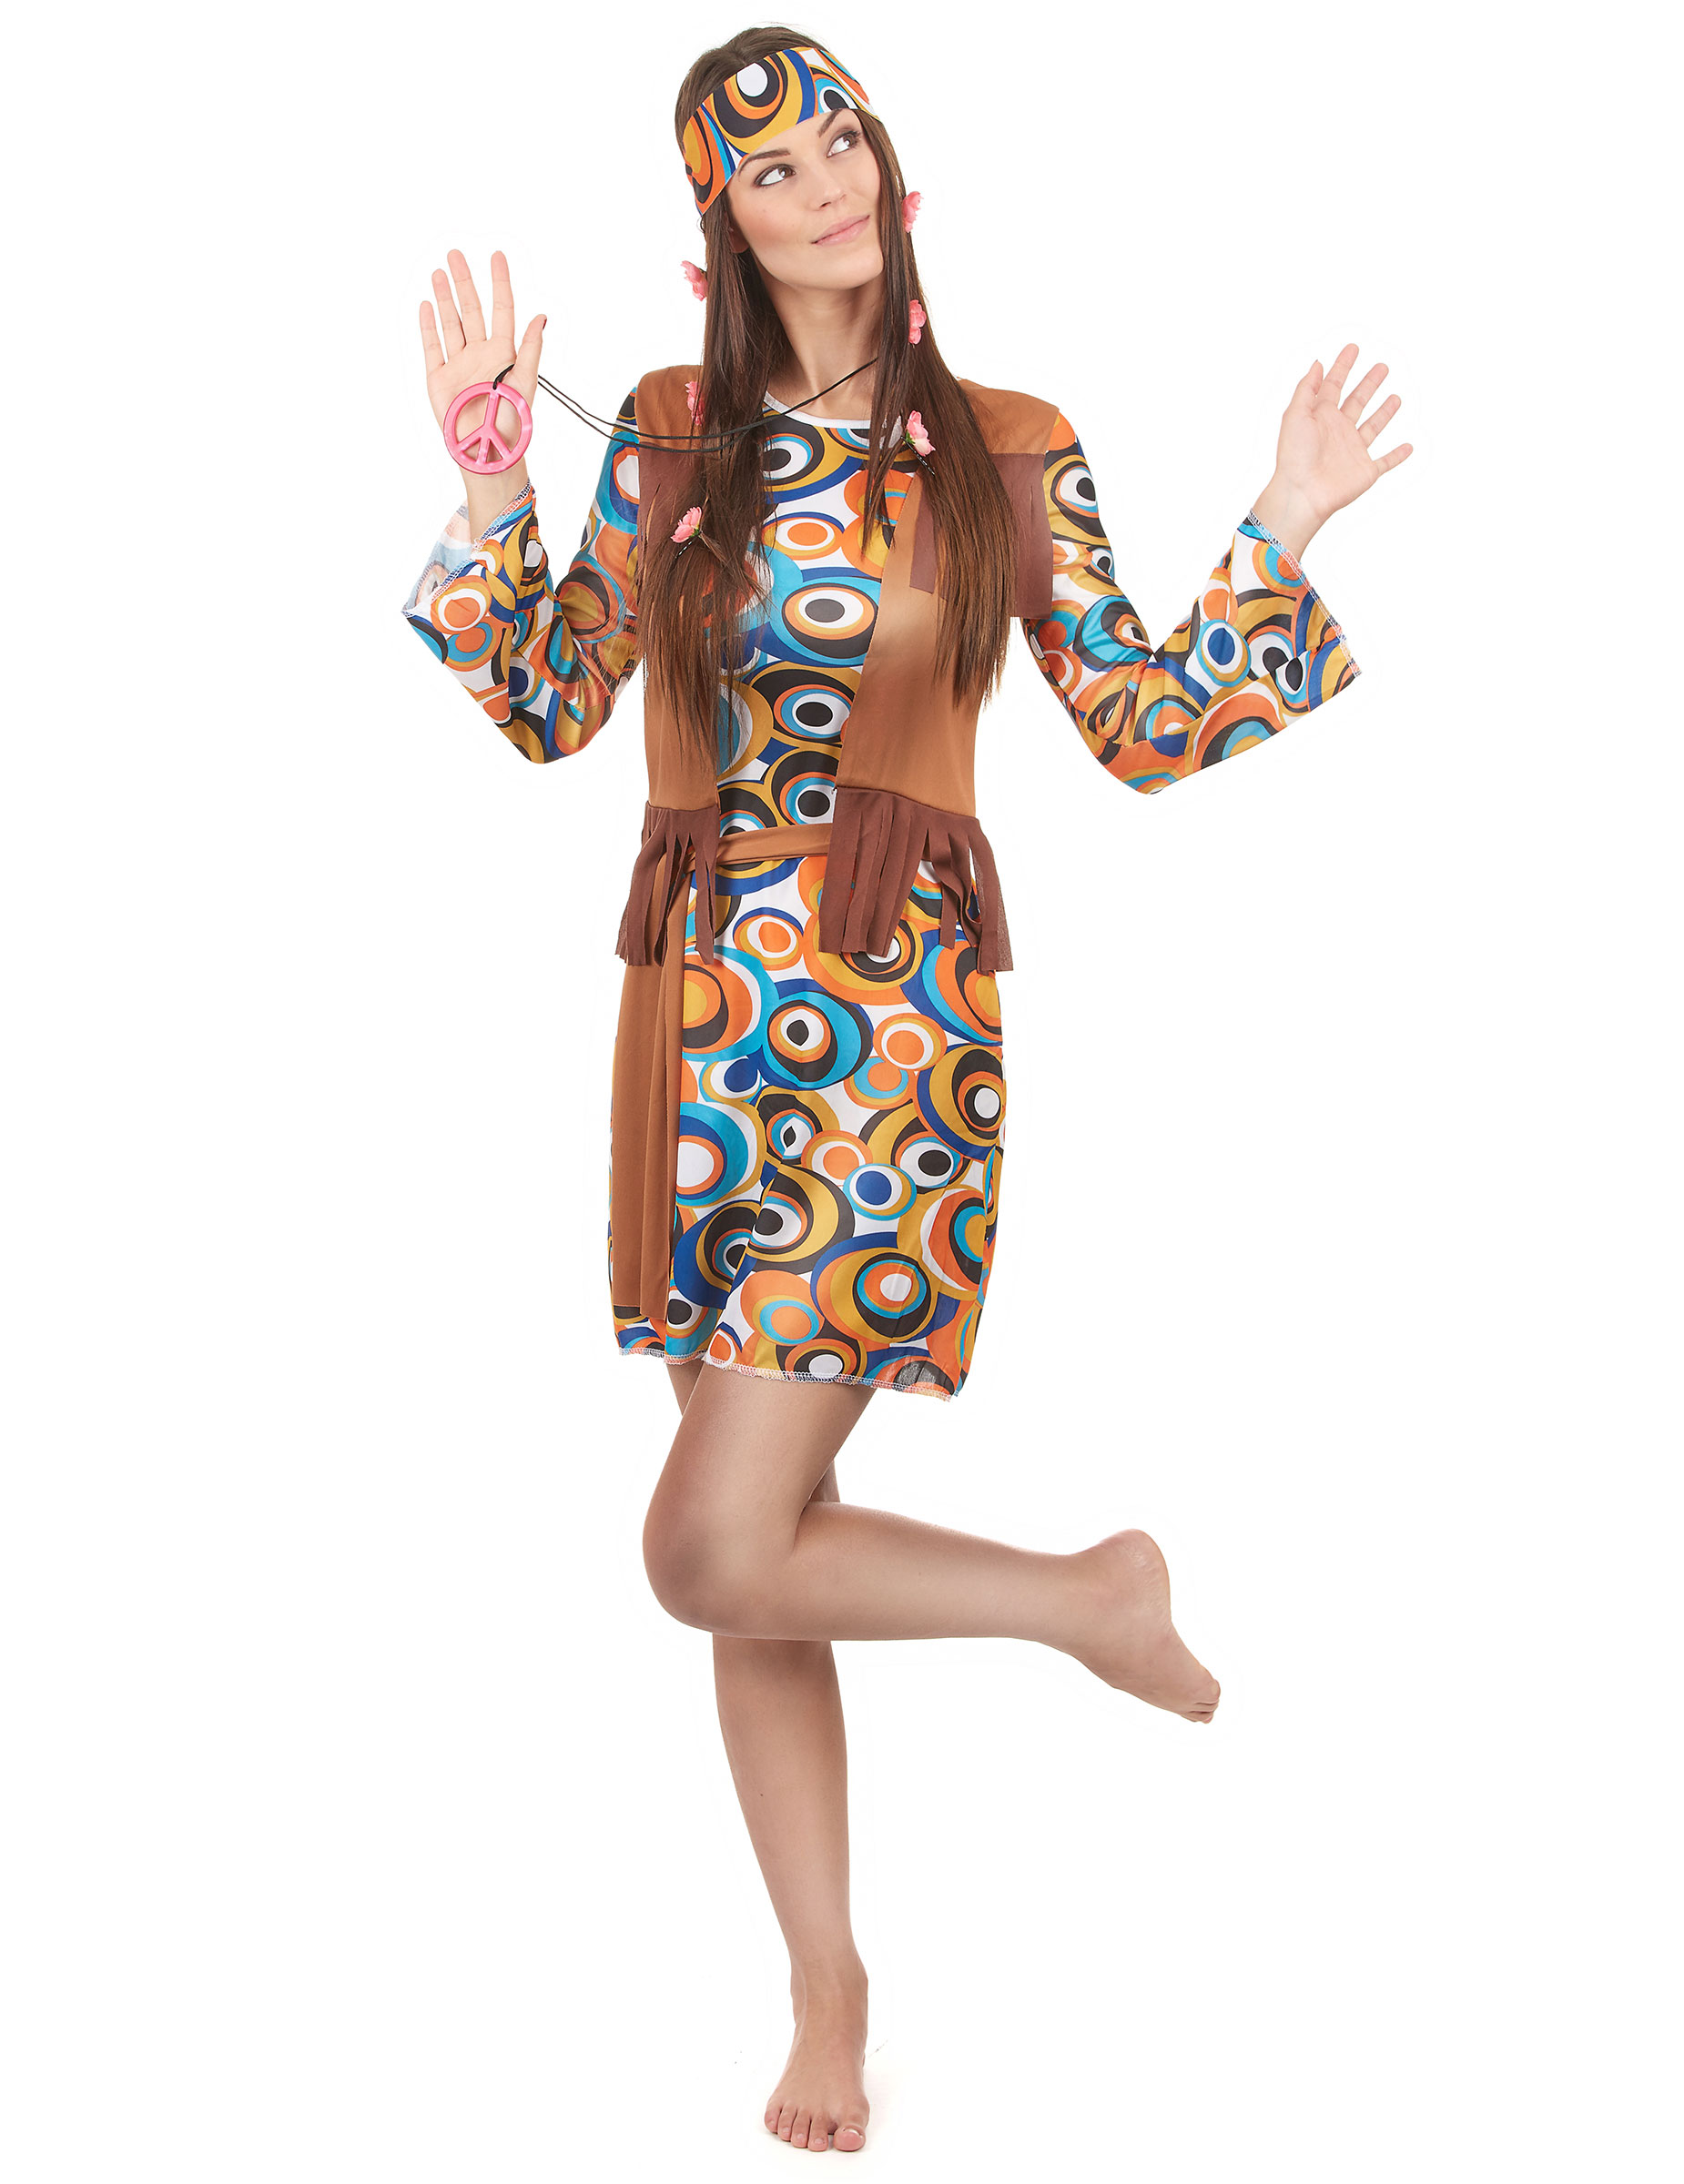 hippie damenkost m 60er outfit mit kreisen bunt g nstige faschings kost me bei karneval megastore. Black Bedroom Furniture Sets. Home Design Ideas